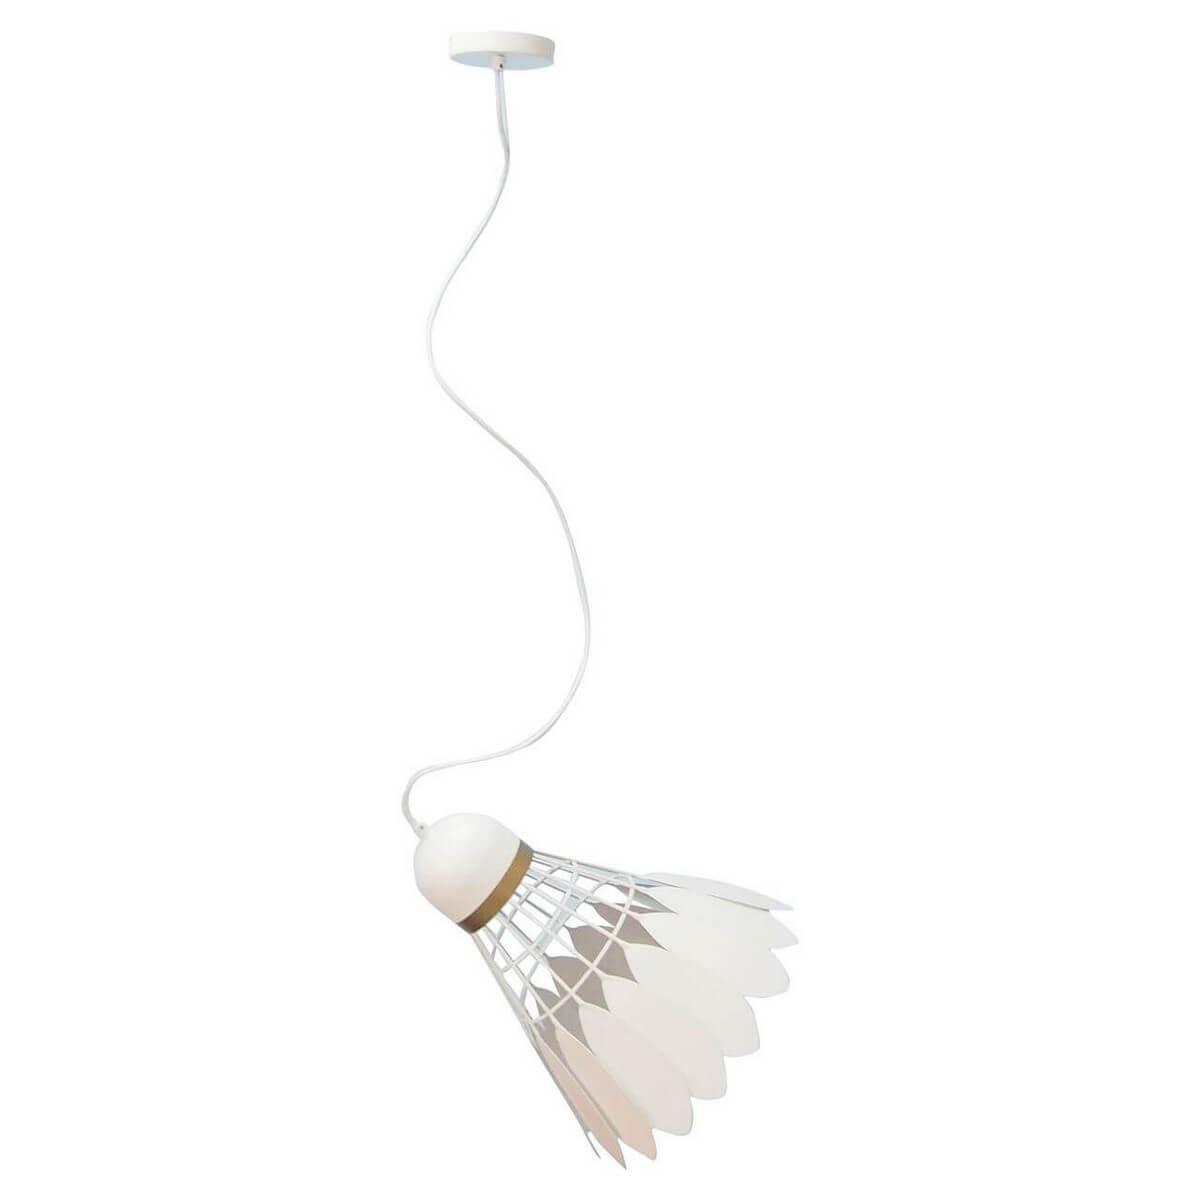 Светильник Lussole LSP-8069 Bristol подвесной светильник lussole loft bristol grlsp 8069